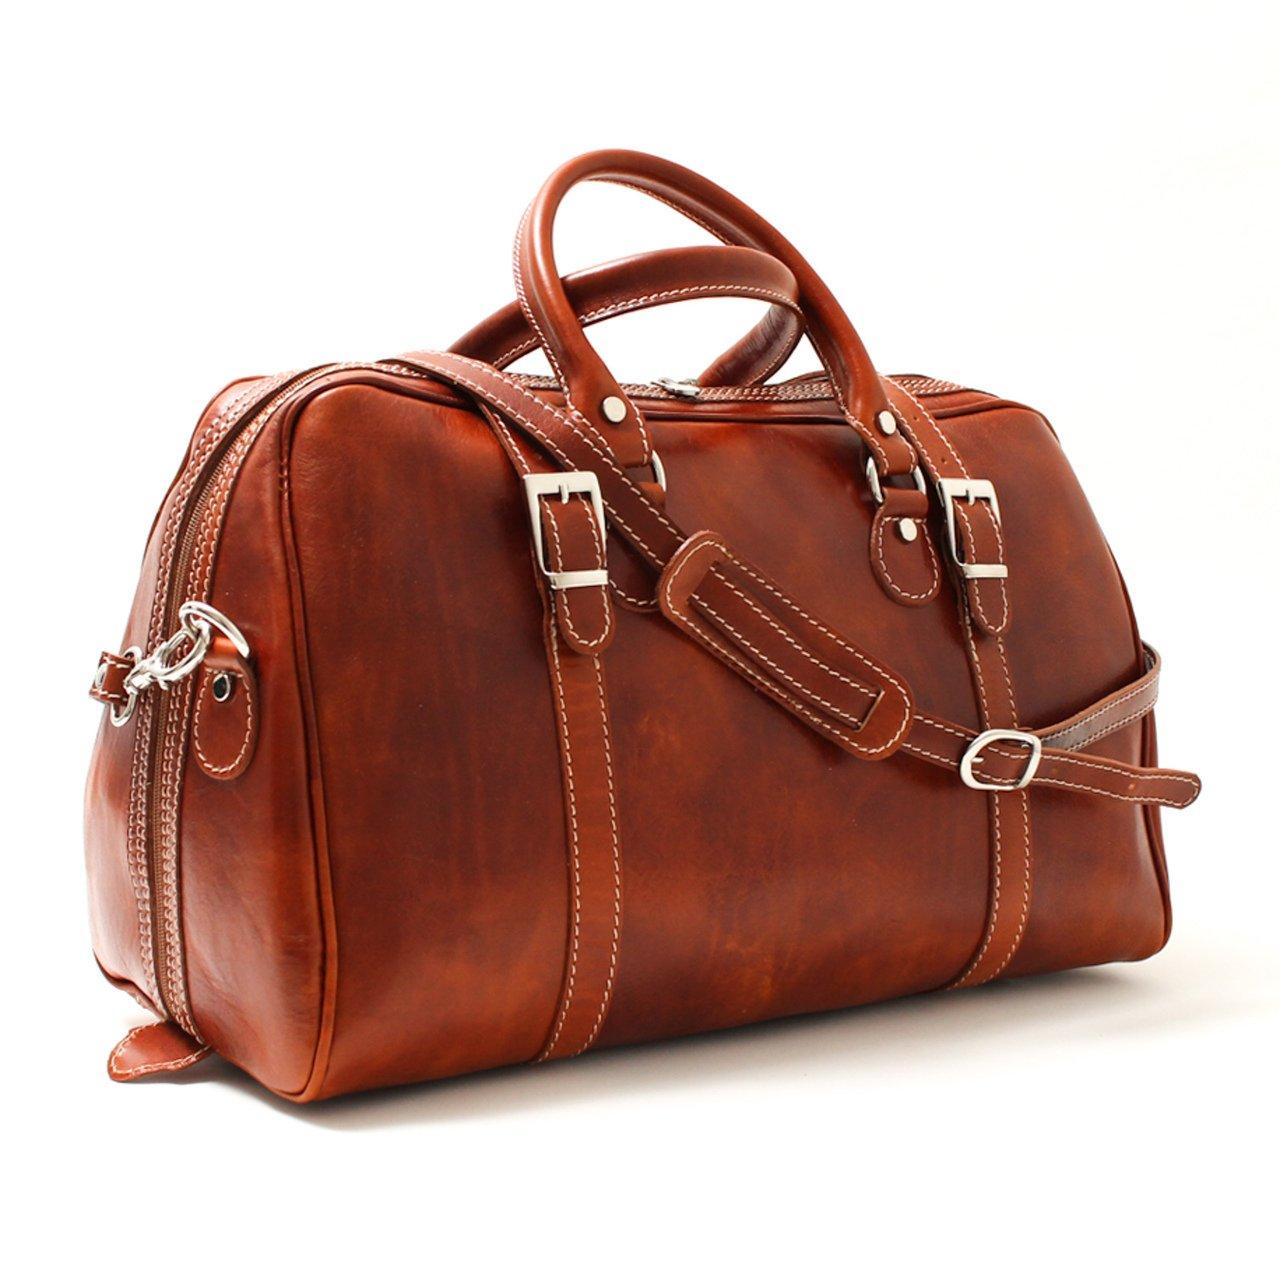 Alberto Bellucci Unisex Italian Leather Milano Carry-on Wayfarer Duffel Bag in Honey